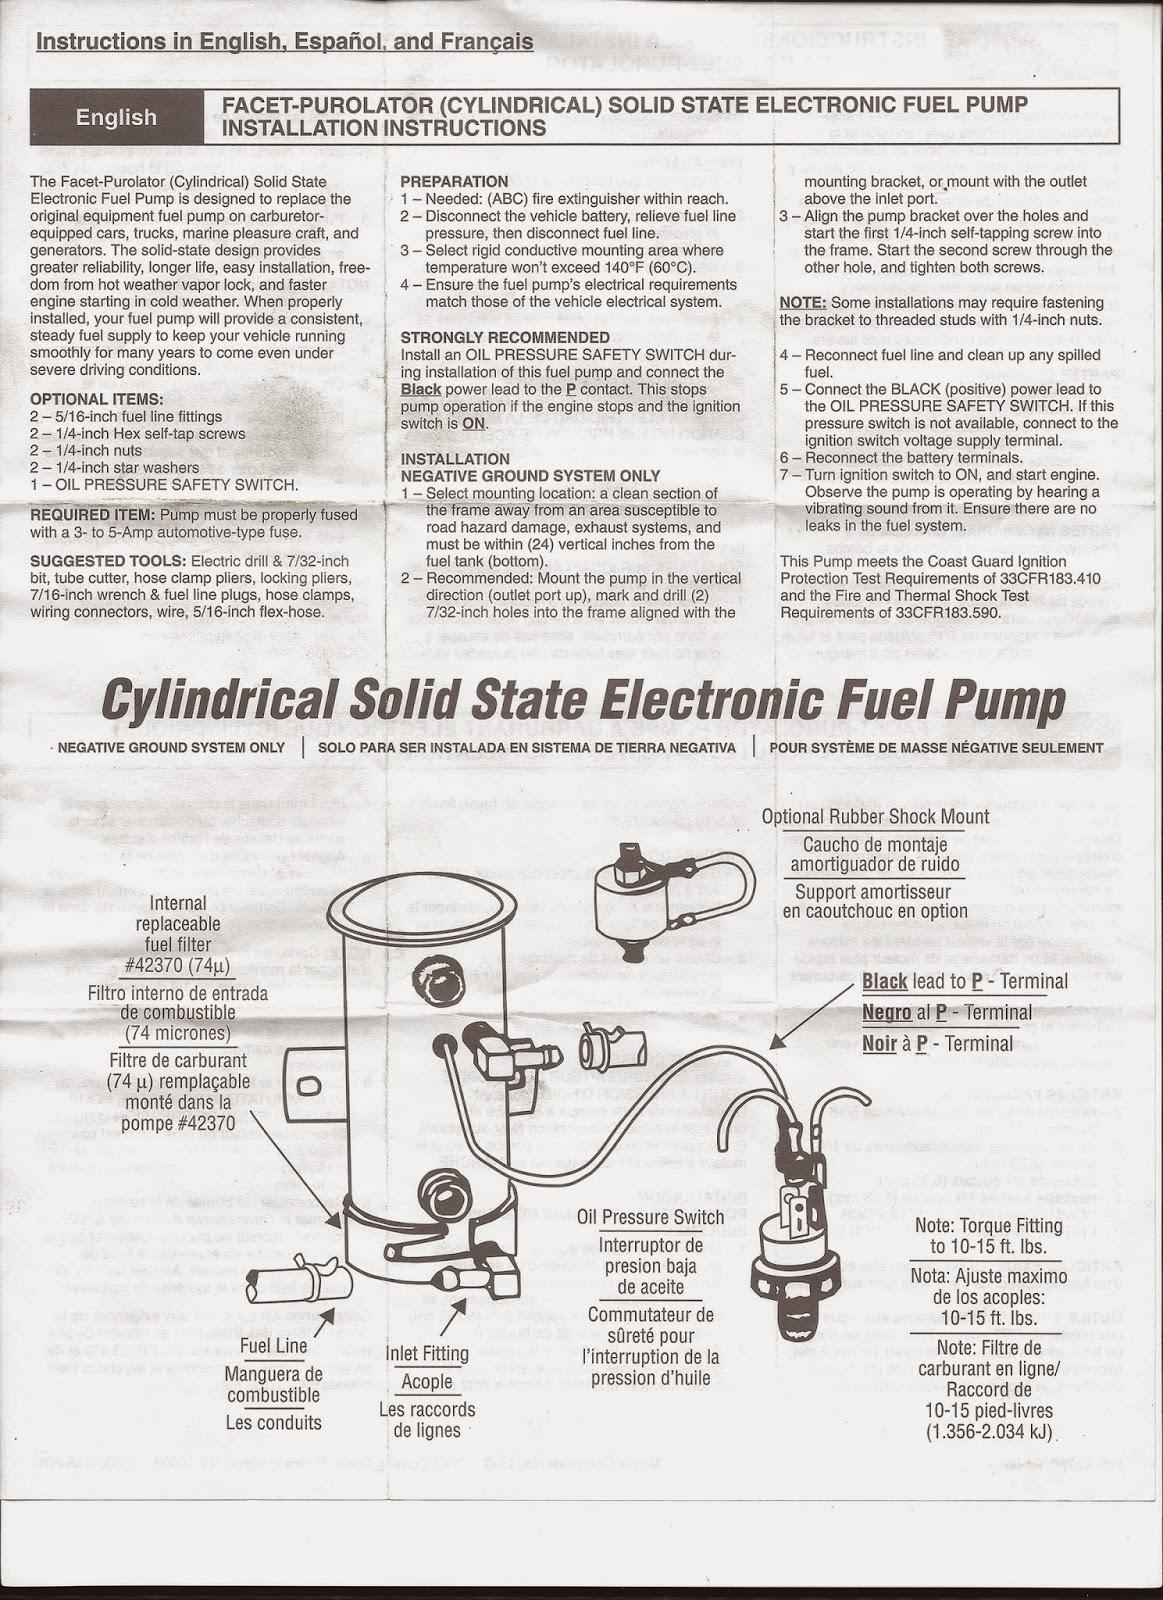 Facet Fuel Filters